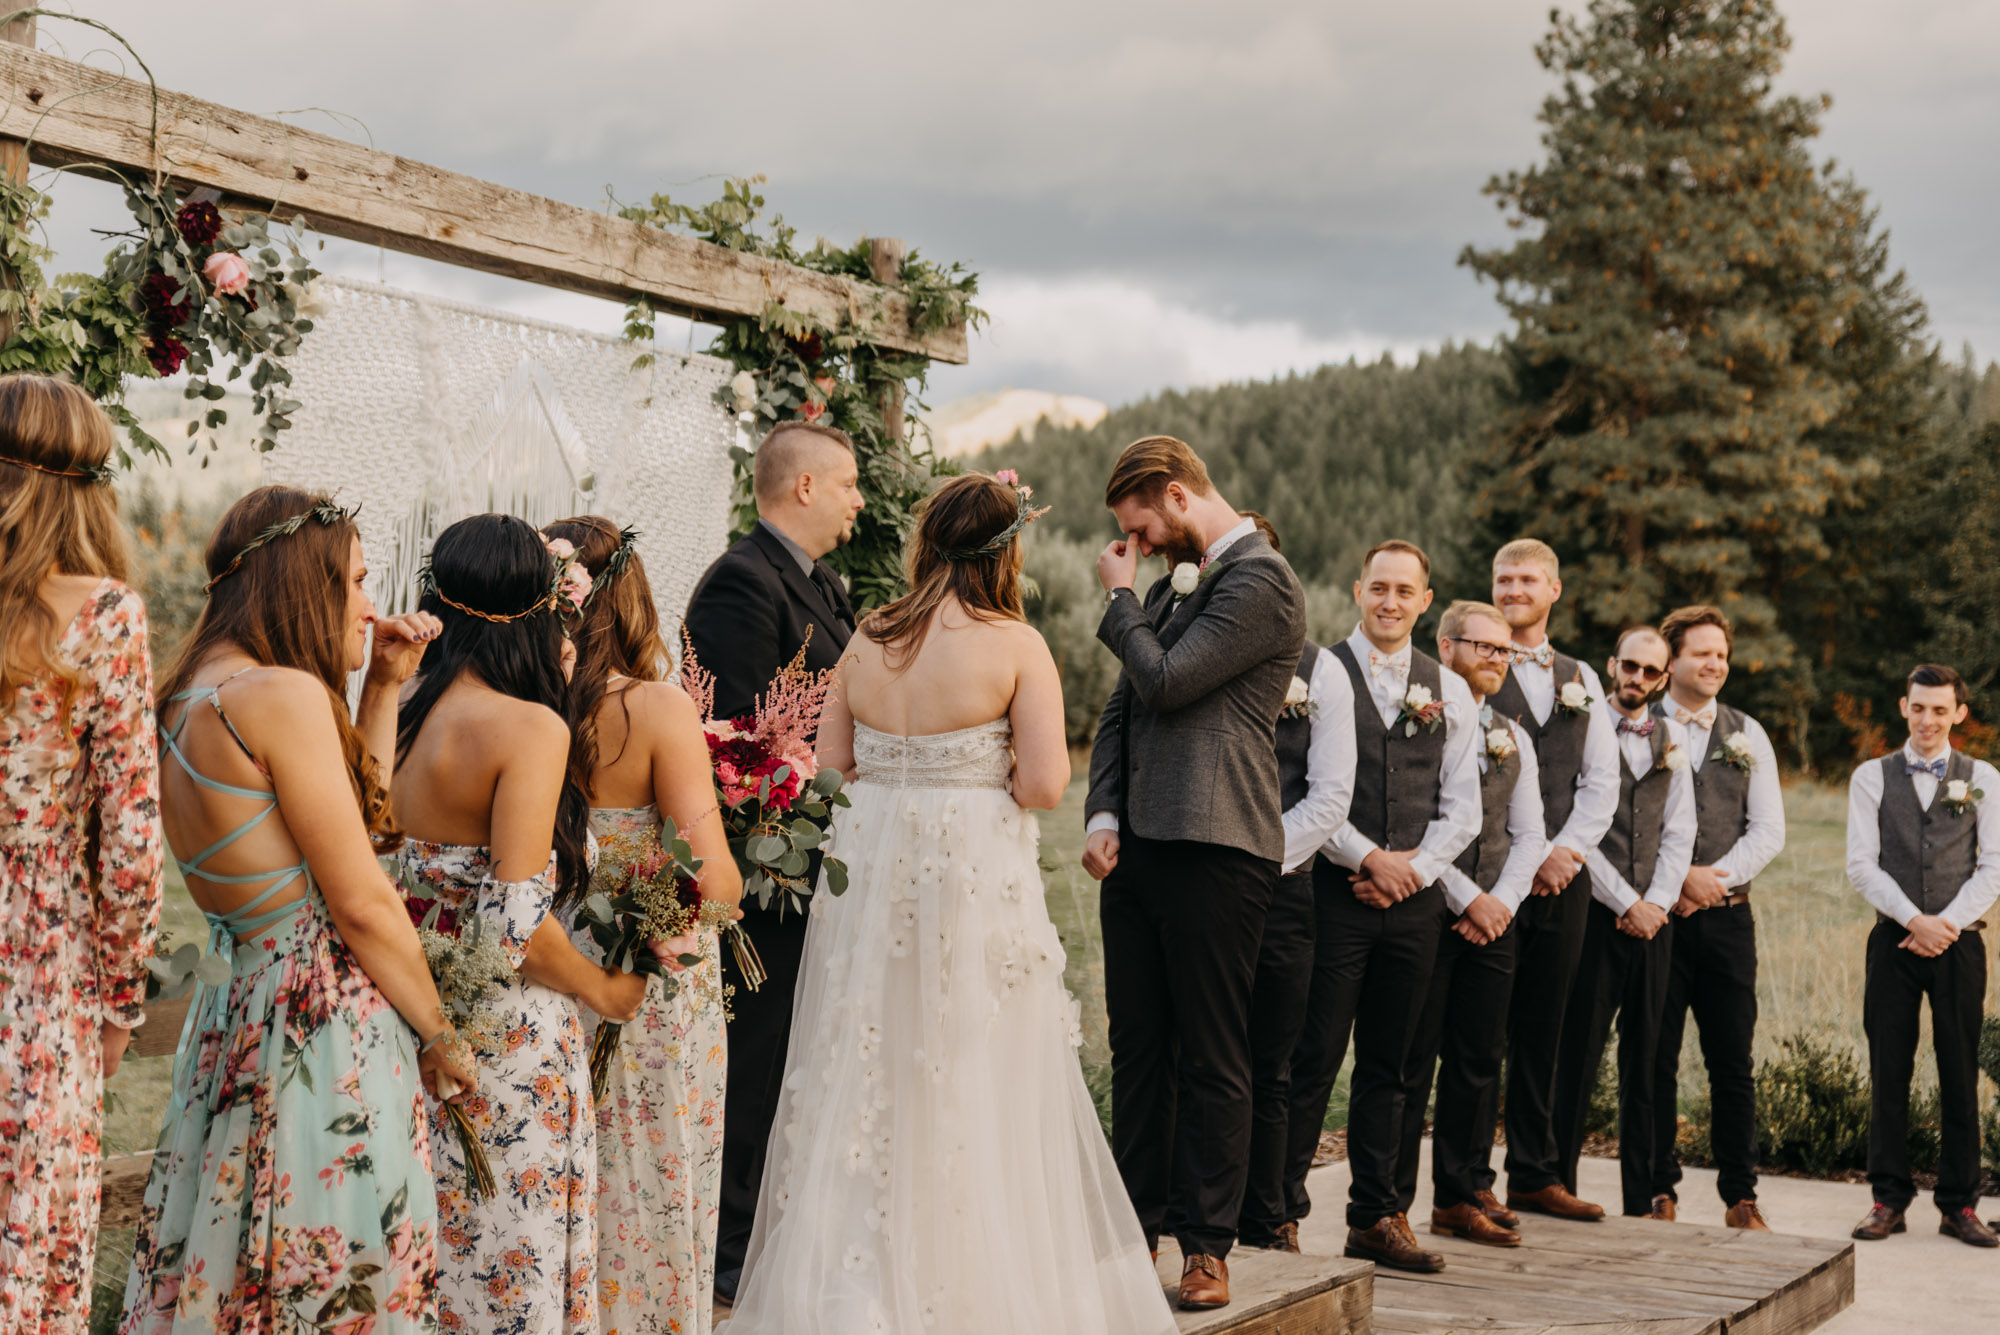 Outdoor-Summer-Ceremony-Washington-Wedding-Rainbow-5403.jpg